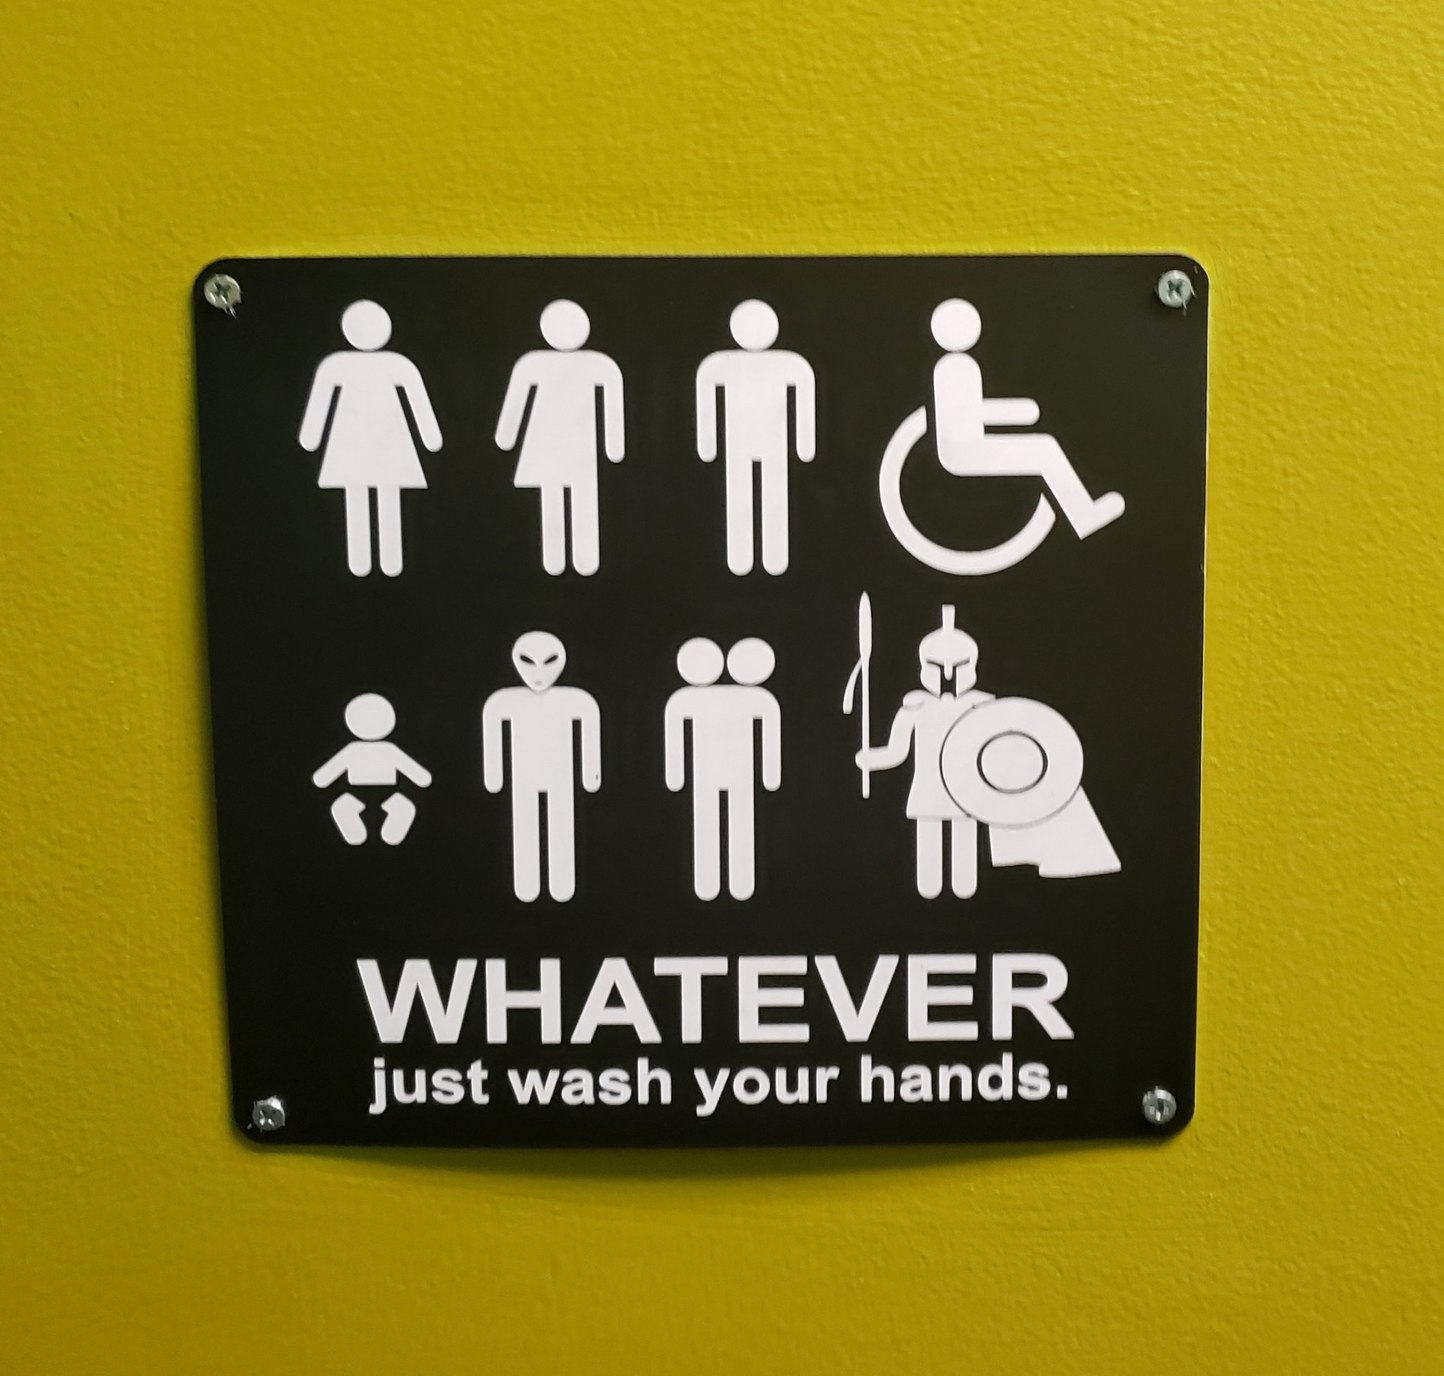 Wash your hands - meme